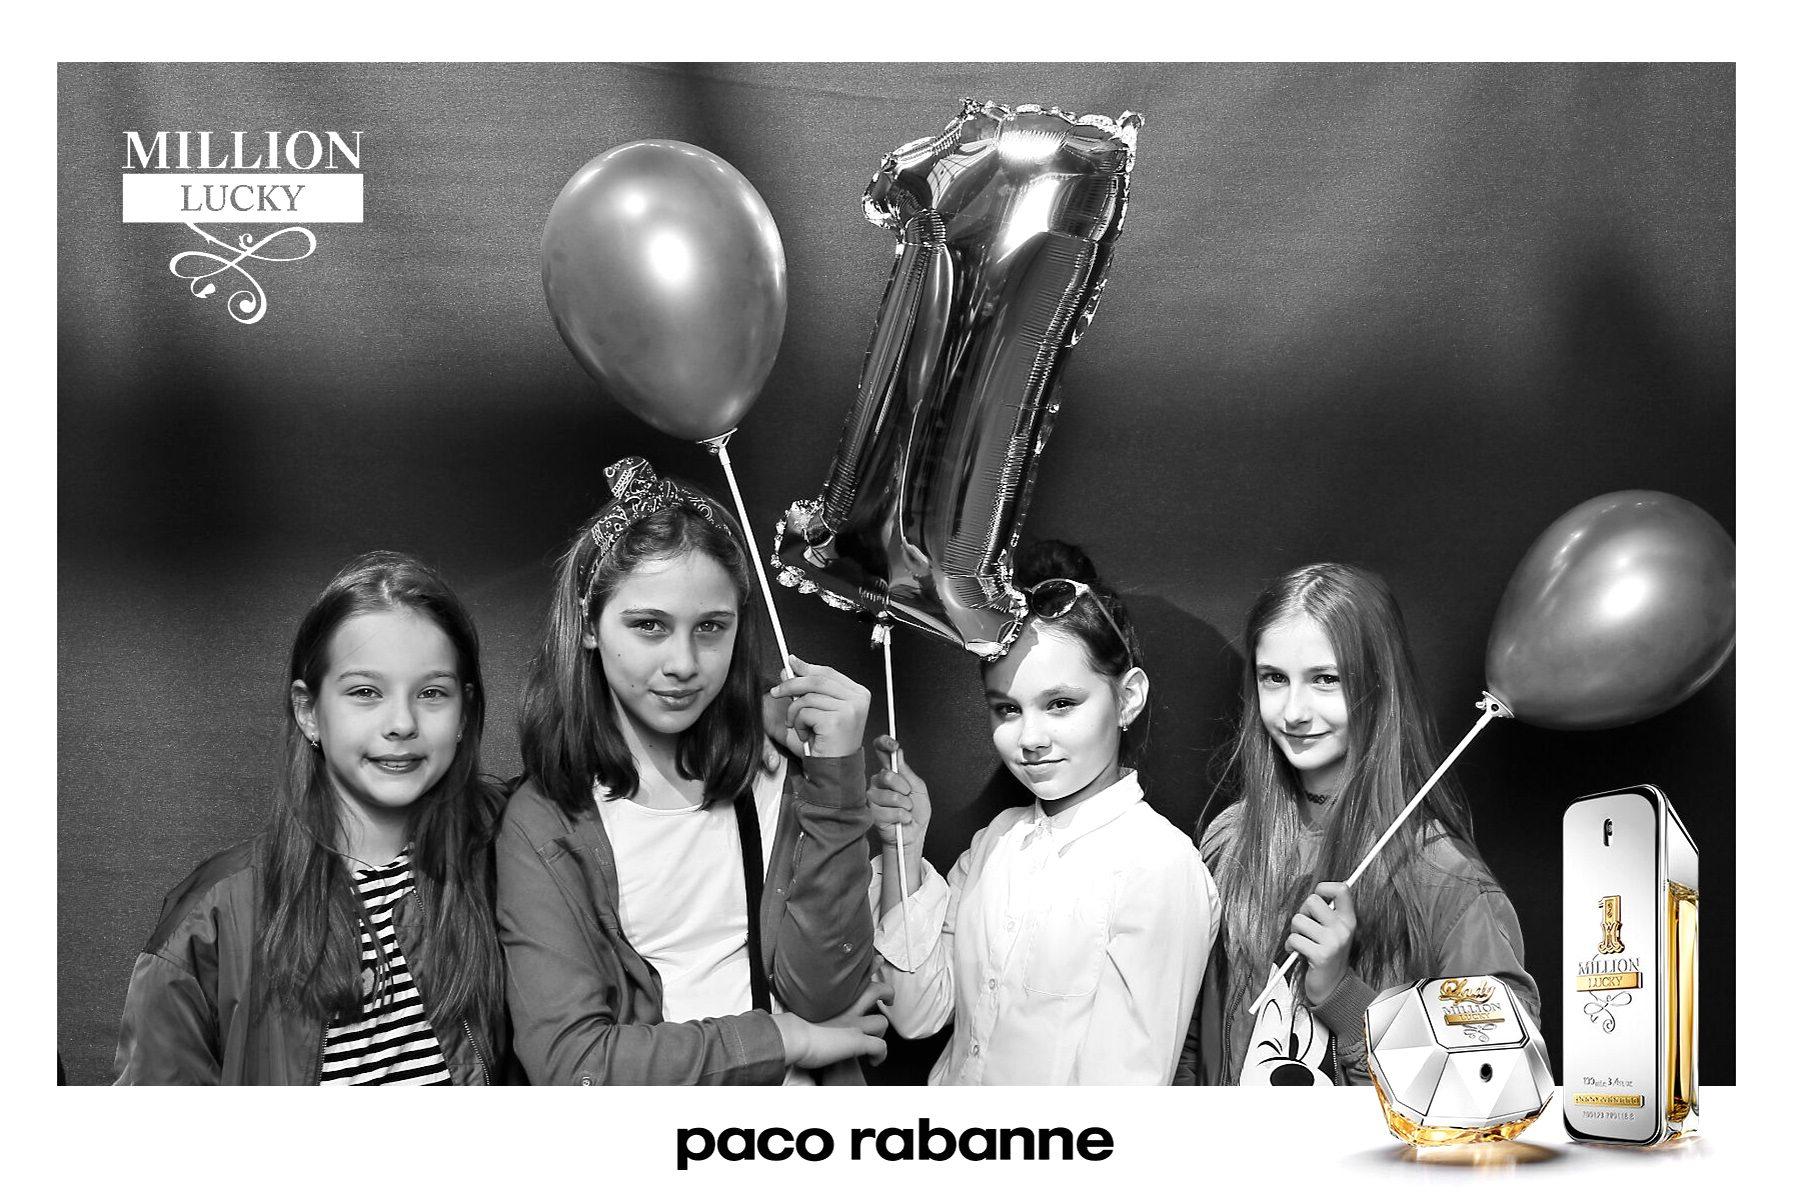 fotokoutek-paco-rabanne-million-lucky-7-4-2018-405207